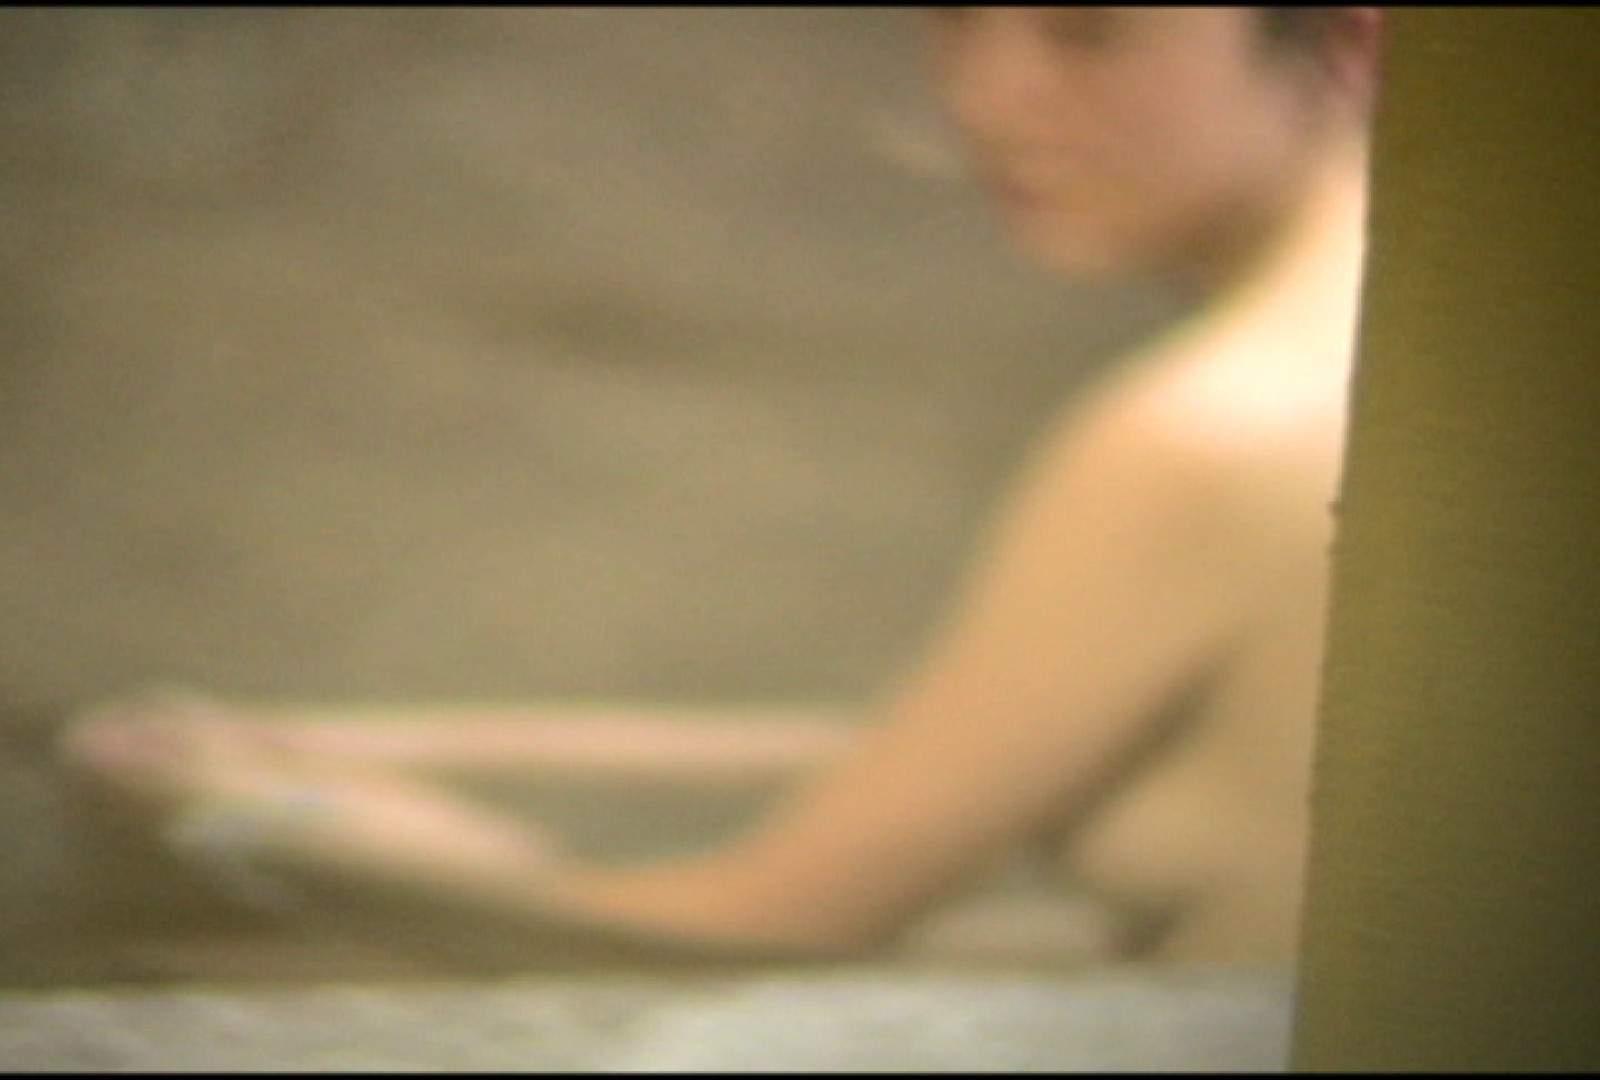 Aquaな露天風呂Vol.699 綺麗なOLたち  105枚 9